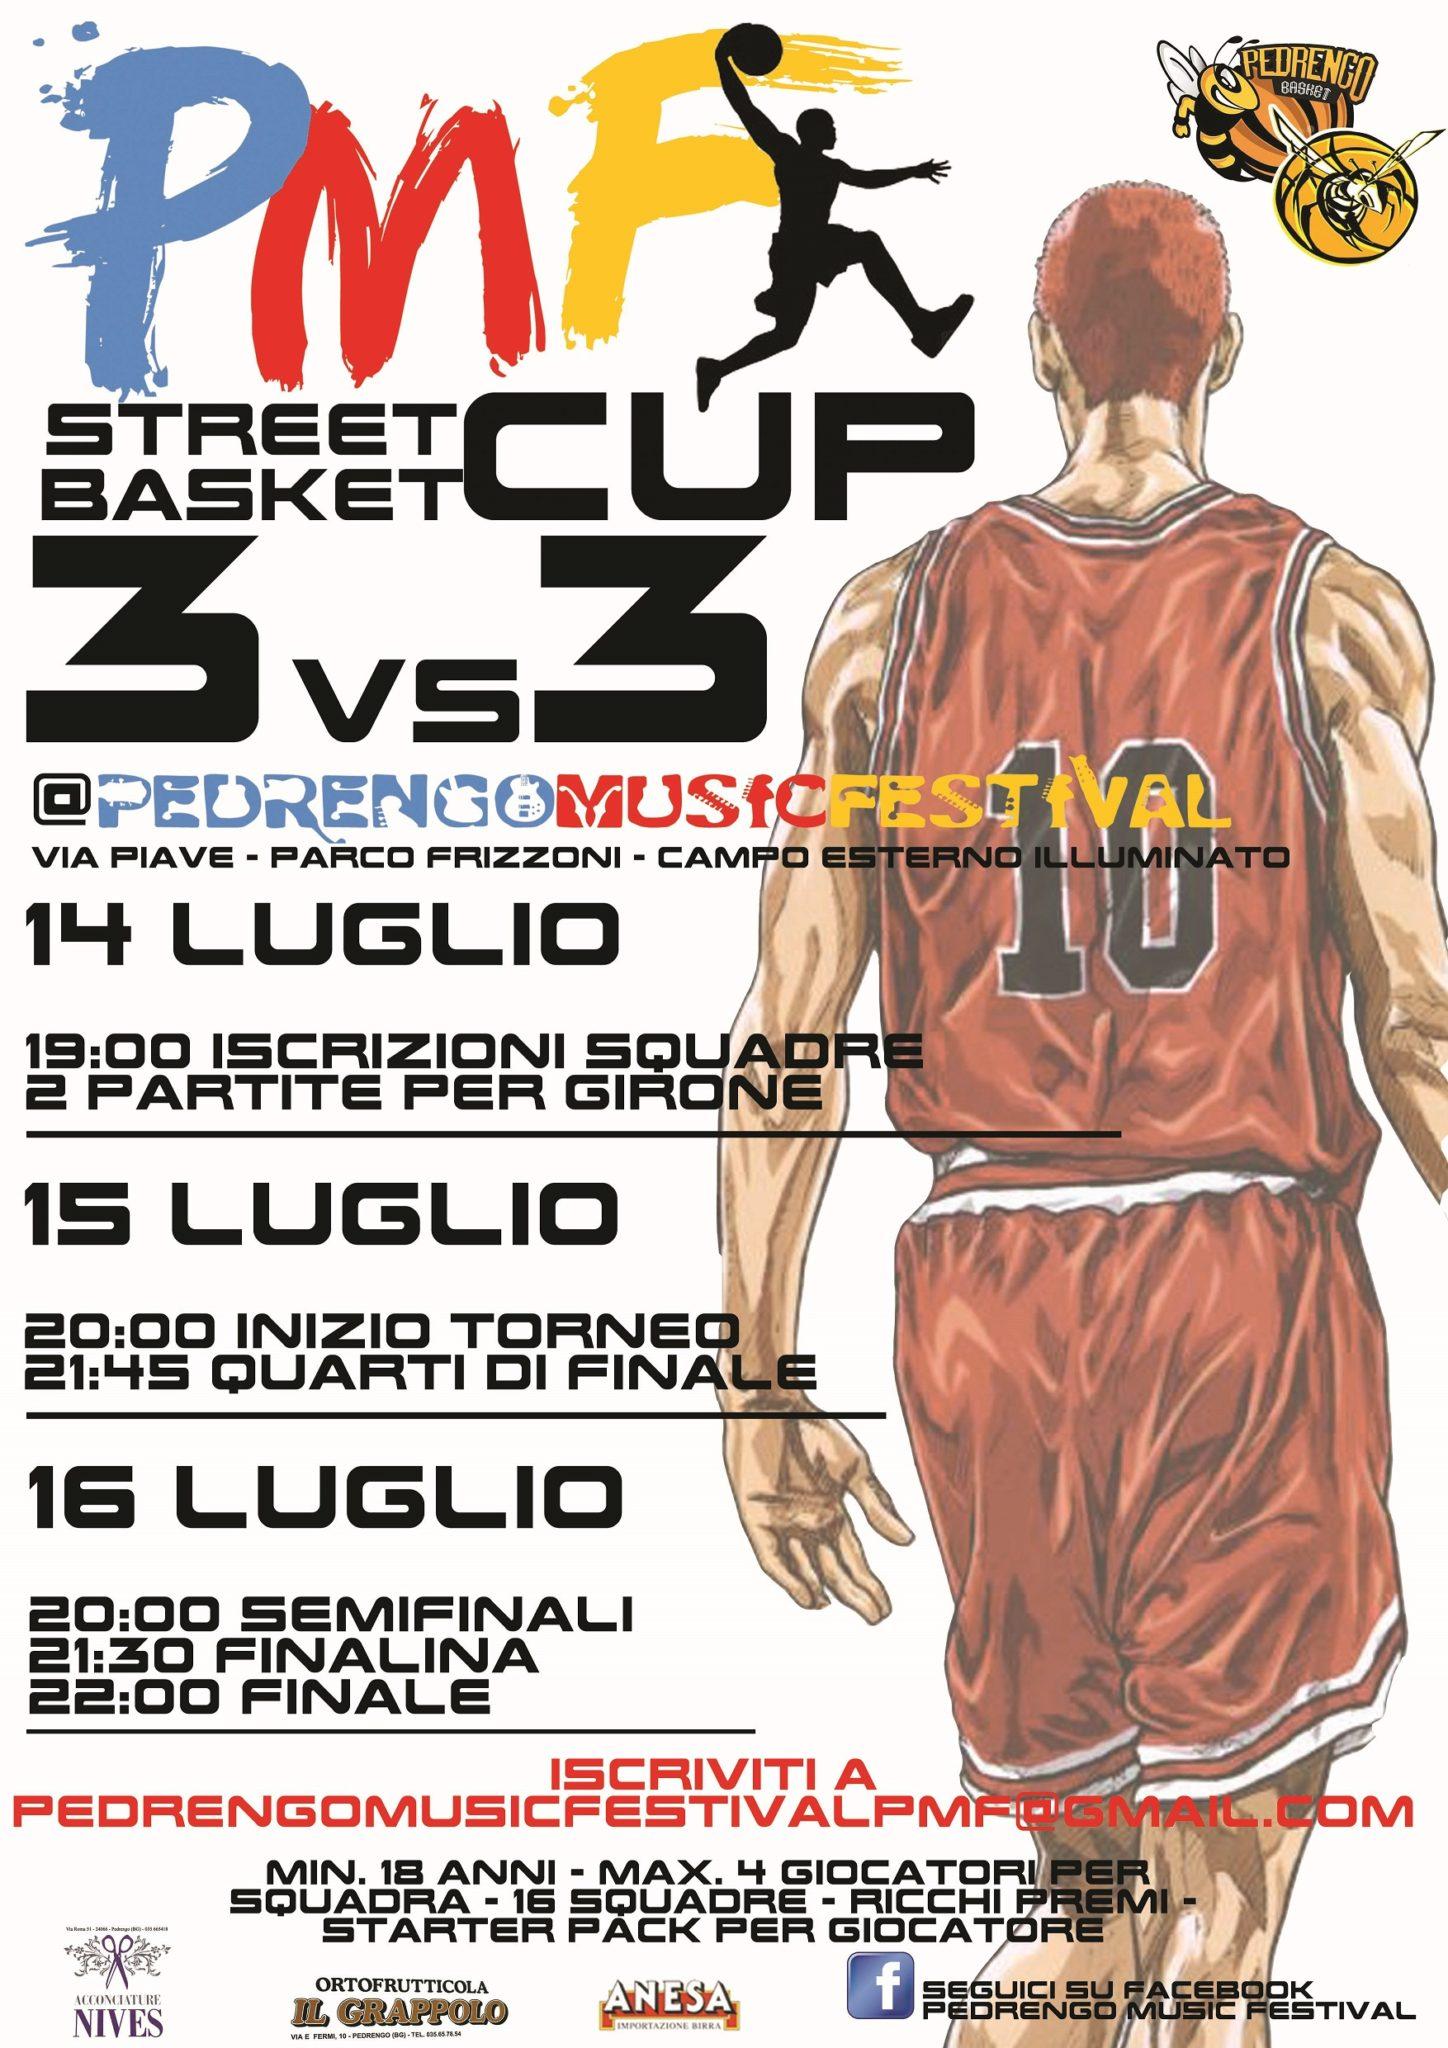 2017-pmf-streetbasketcup-3vs3